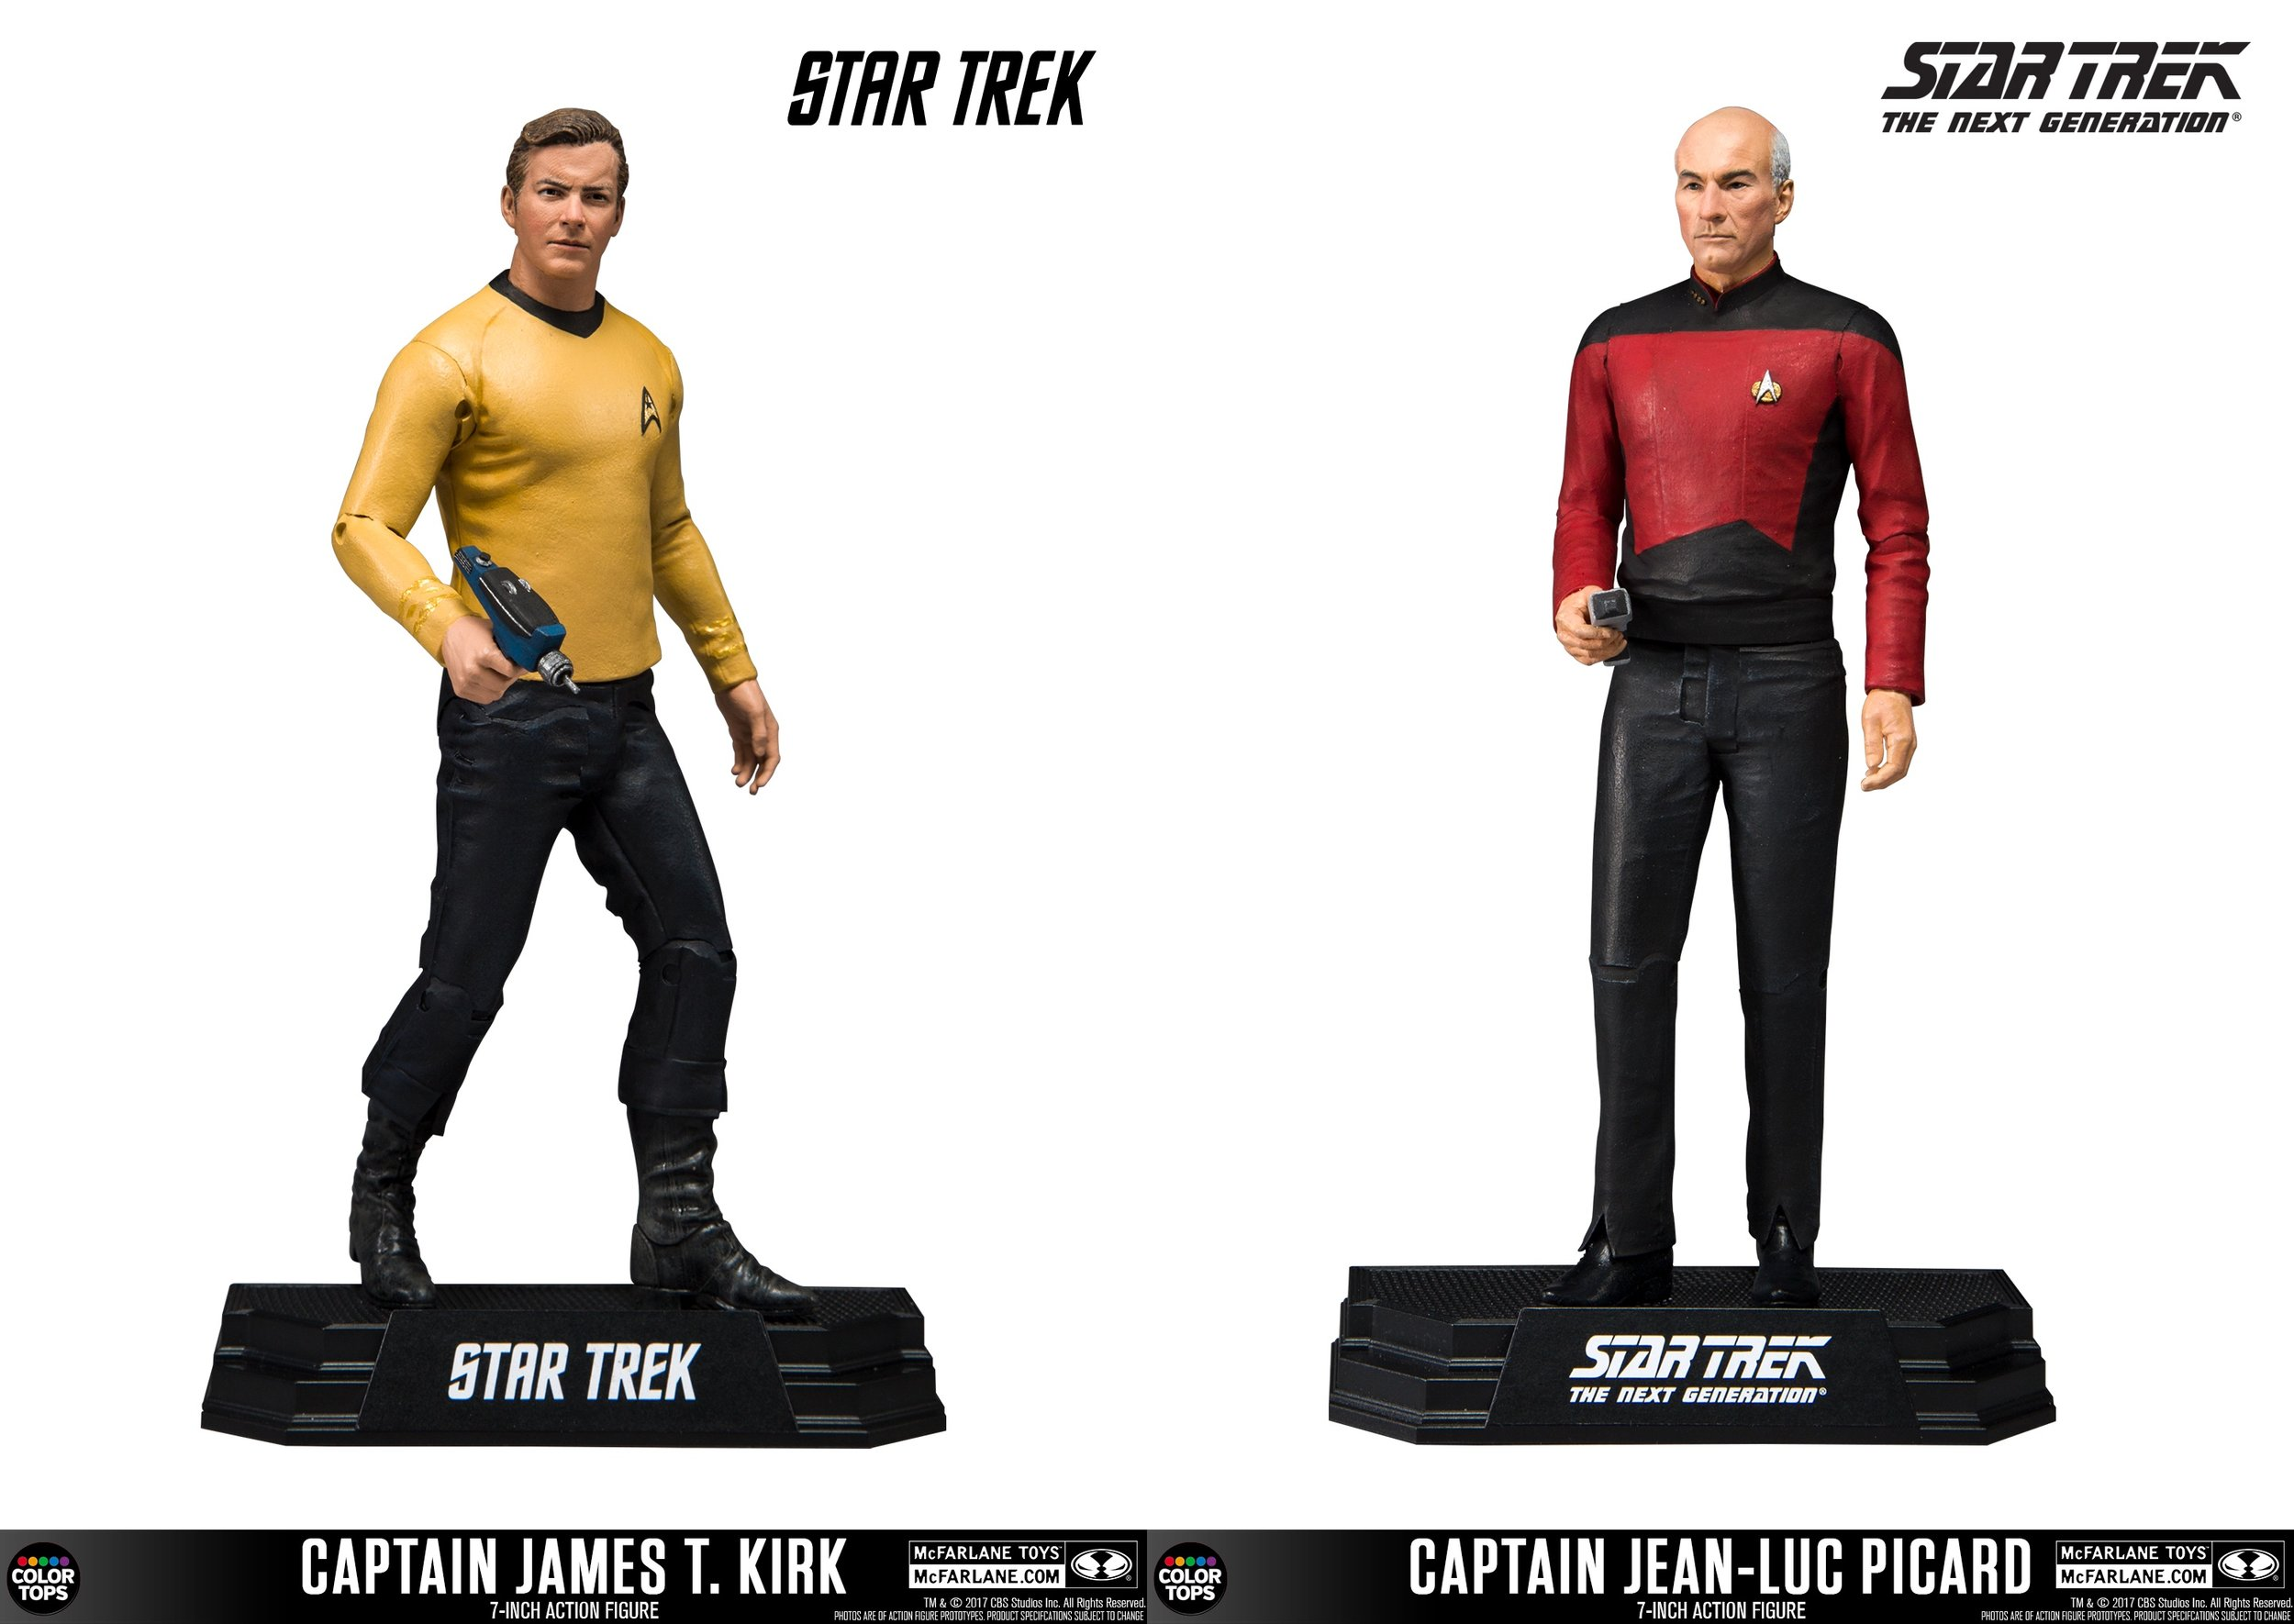 McFarlane Toys Captain Kirk and Captain Picard Star Trek Action Figures Set of 2